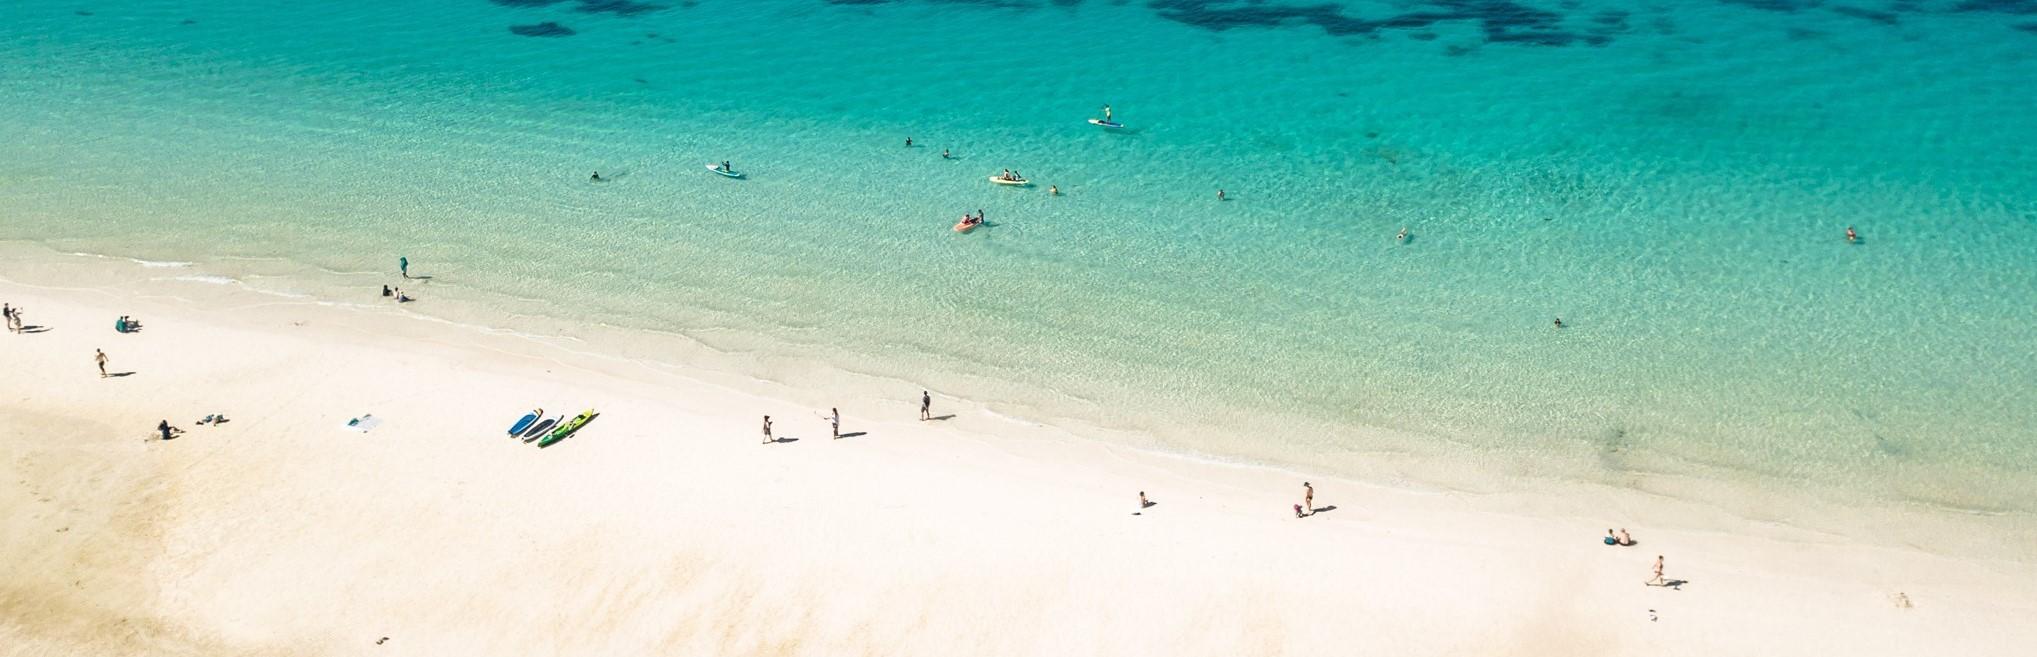 26 Best White Sand Beaches in the Philippines: Palawan, Cebu, Boracay, Bohol, Siargao